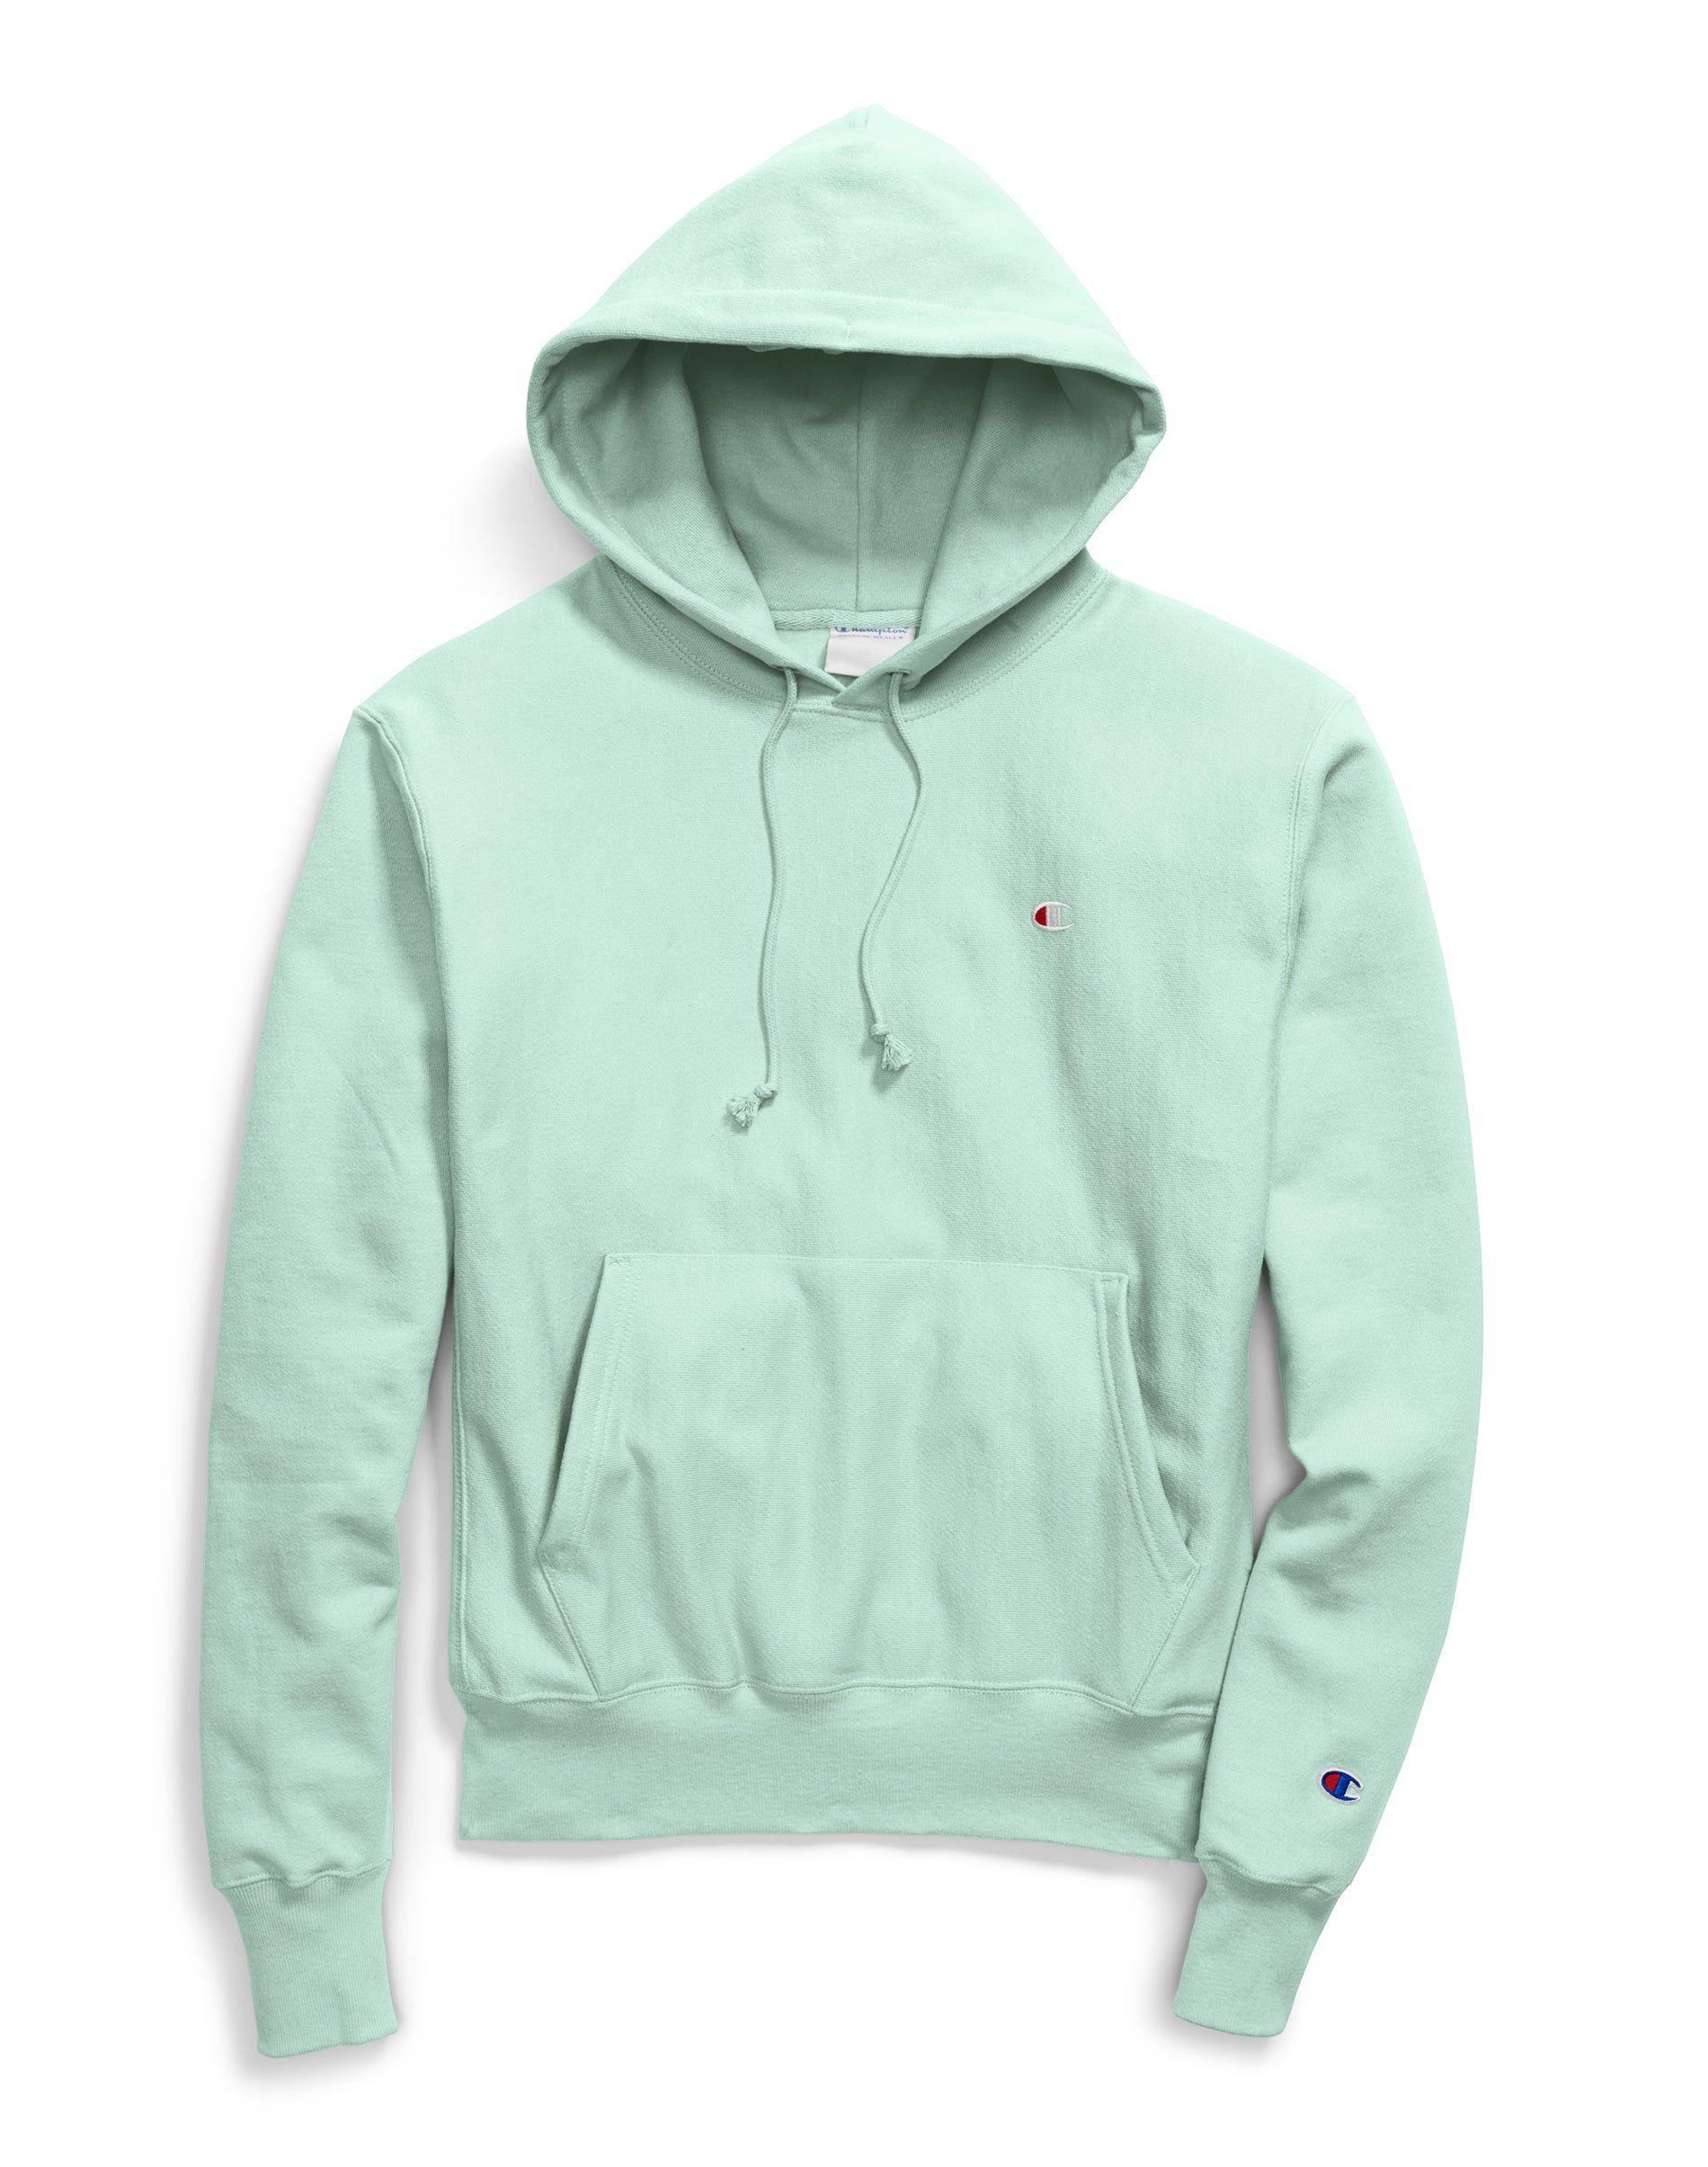 Champion Uo Reverse Weave Hoodie Sweatshirt Sweatshirts Hoodie Champion Clothing Hoodies [ 2175 x 1450 Pixel ]